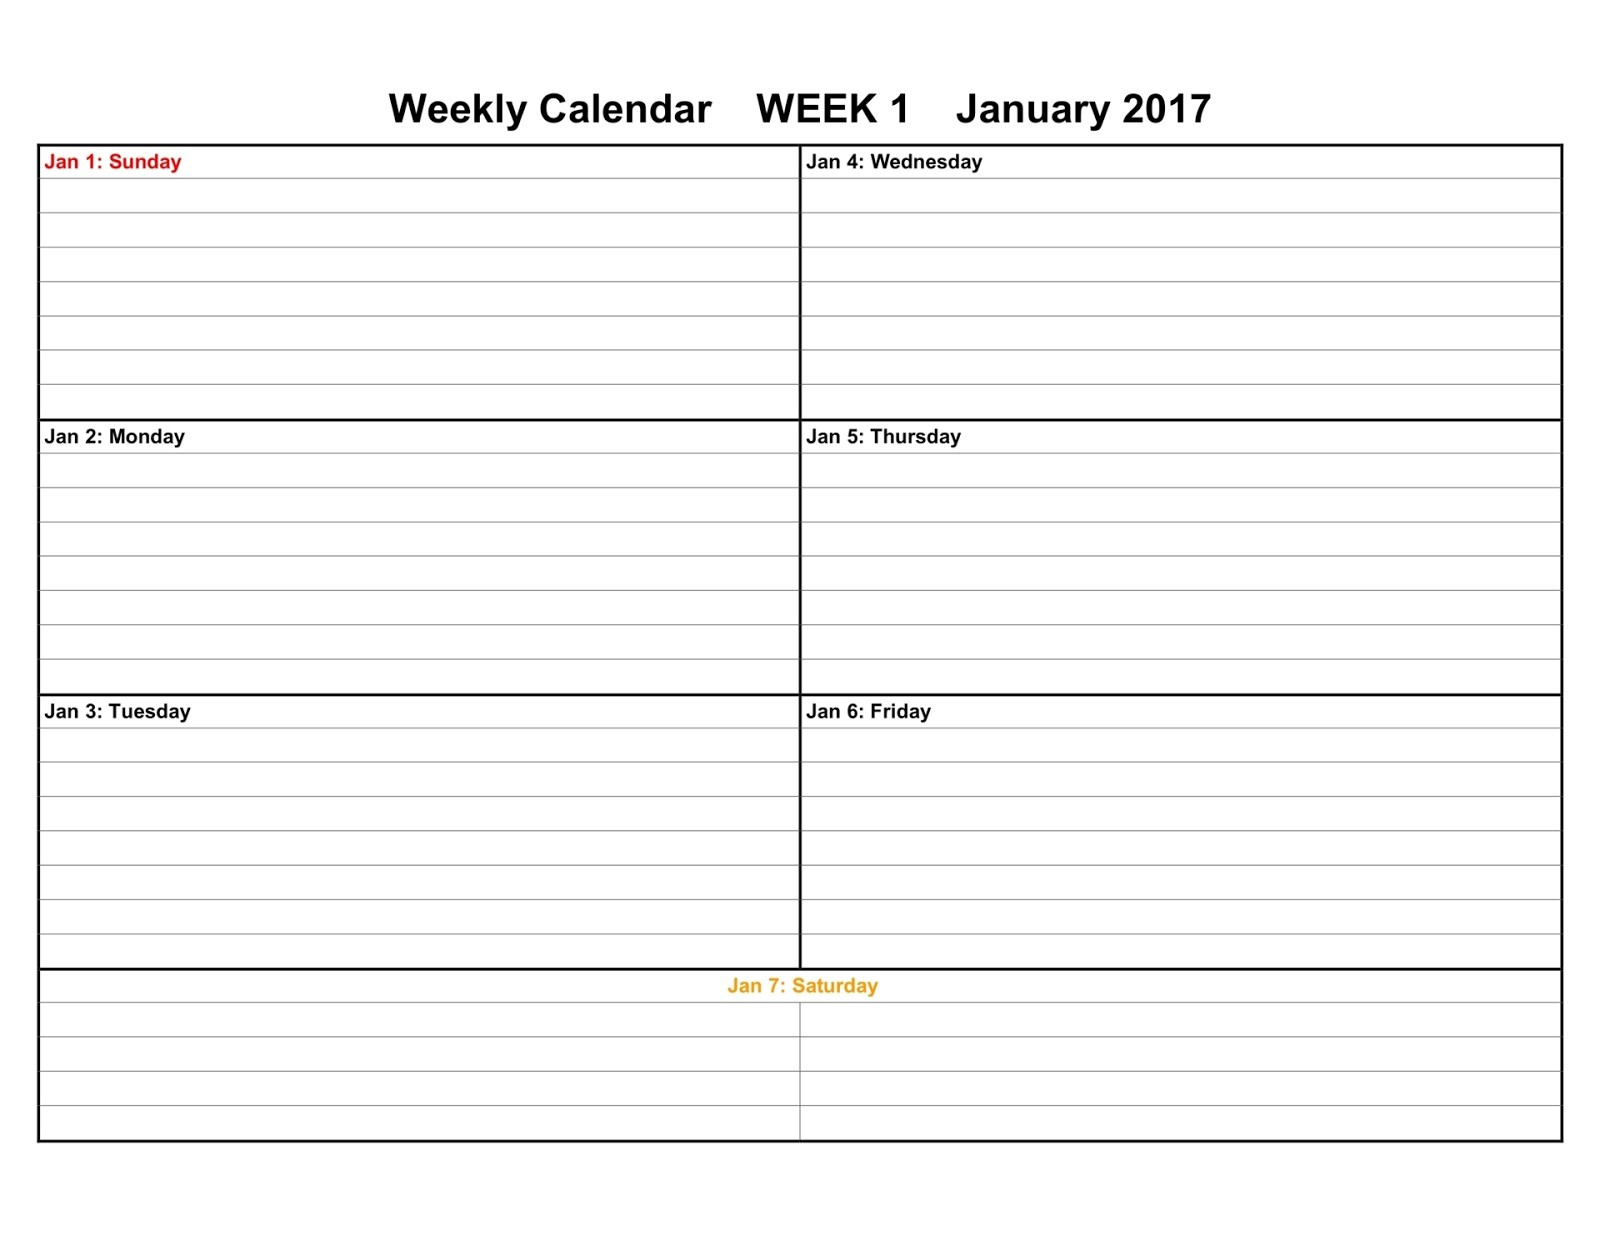 2017 weekly calendar templates